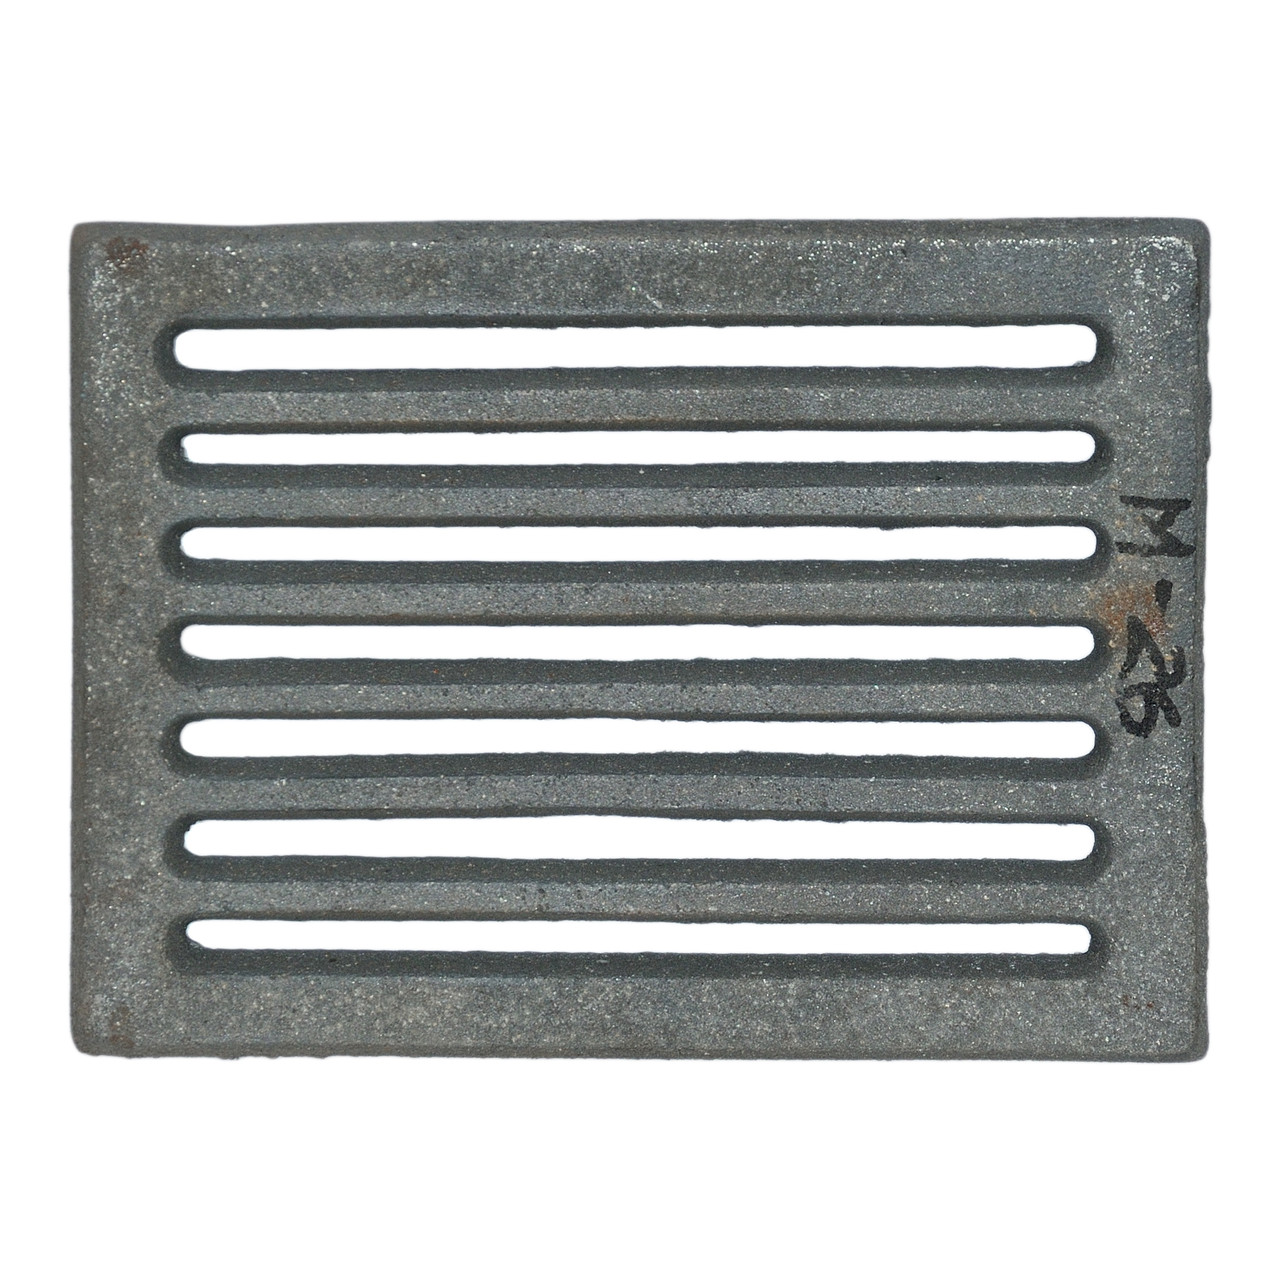 Решетка чугунная для печи   225х165 (8 рядов)